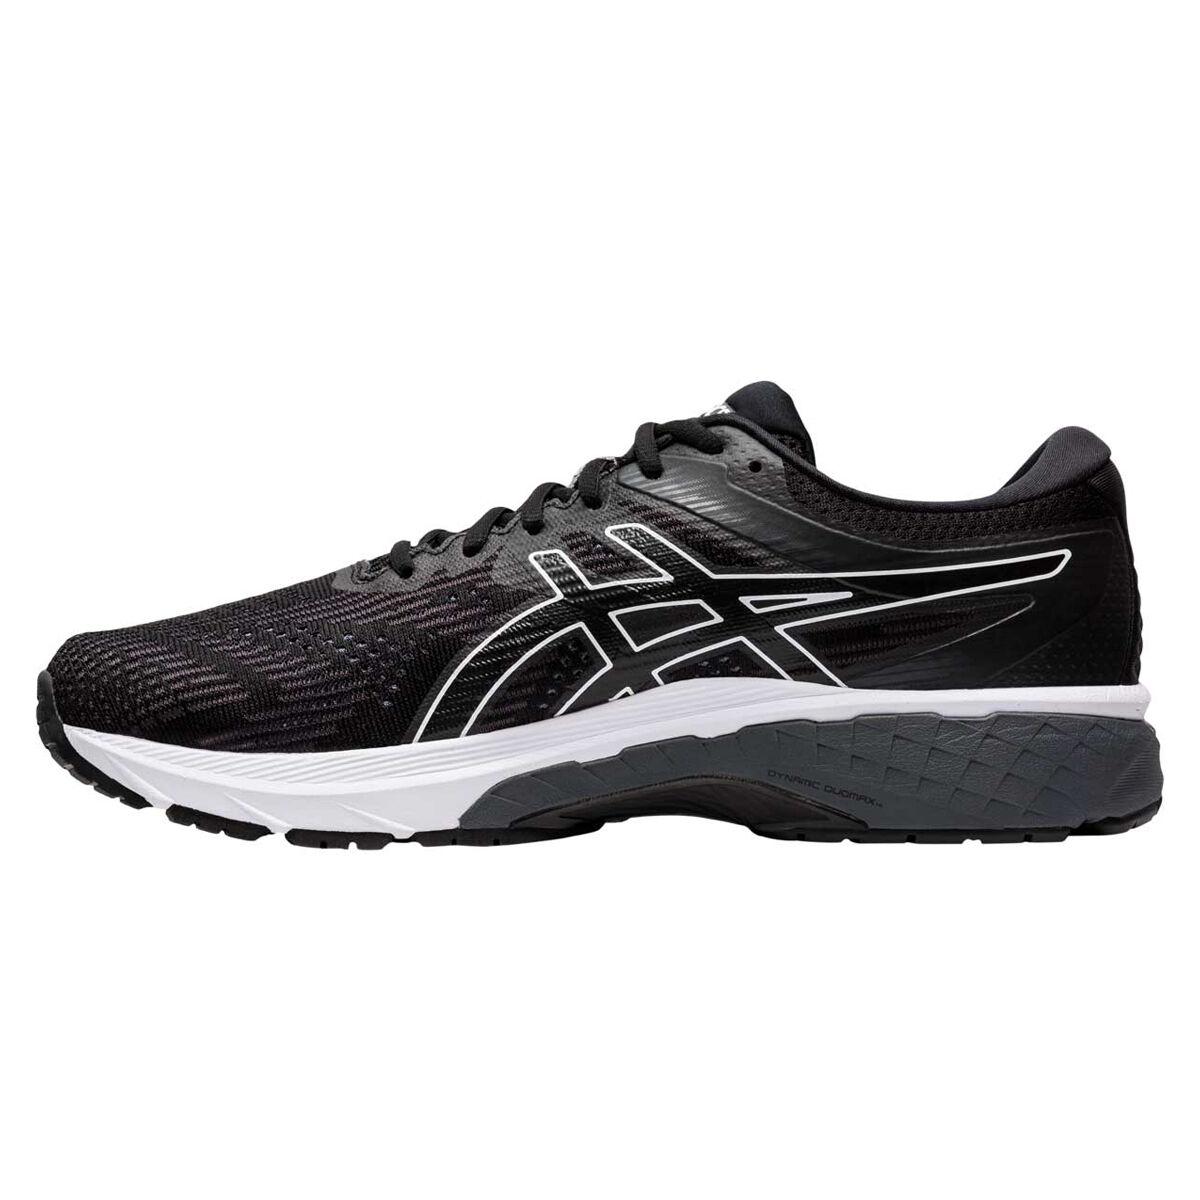 Asics GT 2000 8 Mens Running Shoes